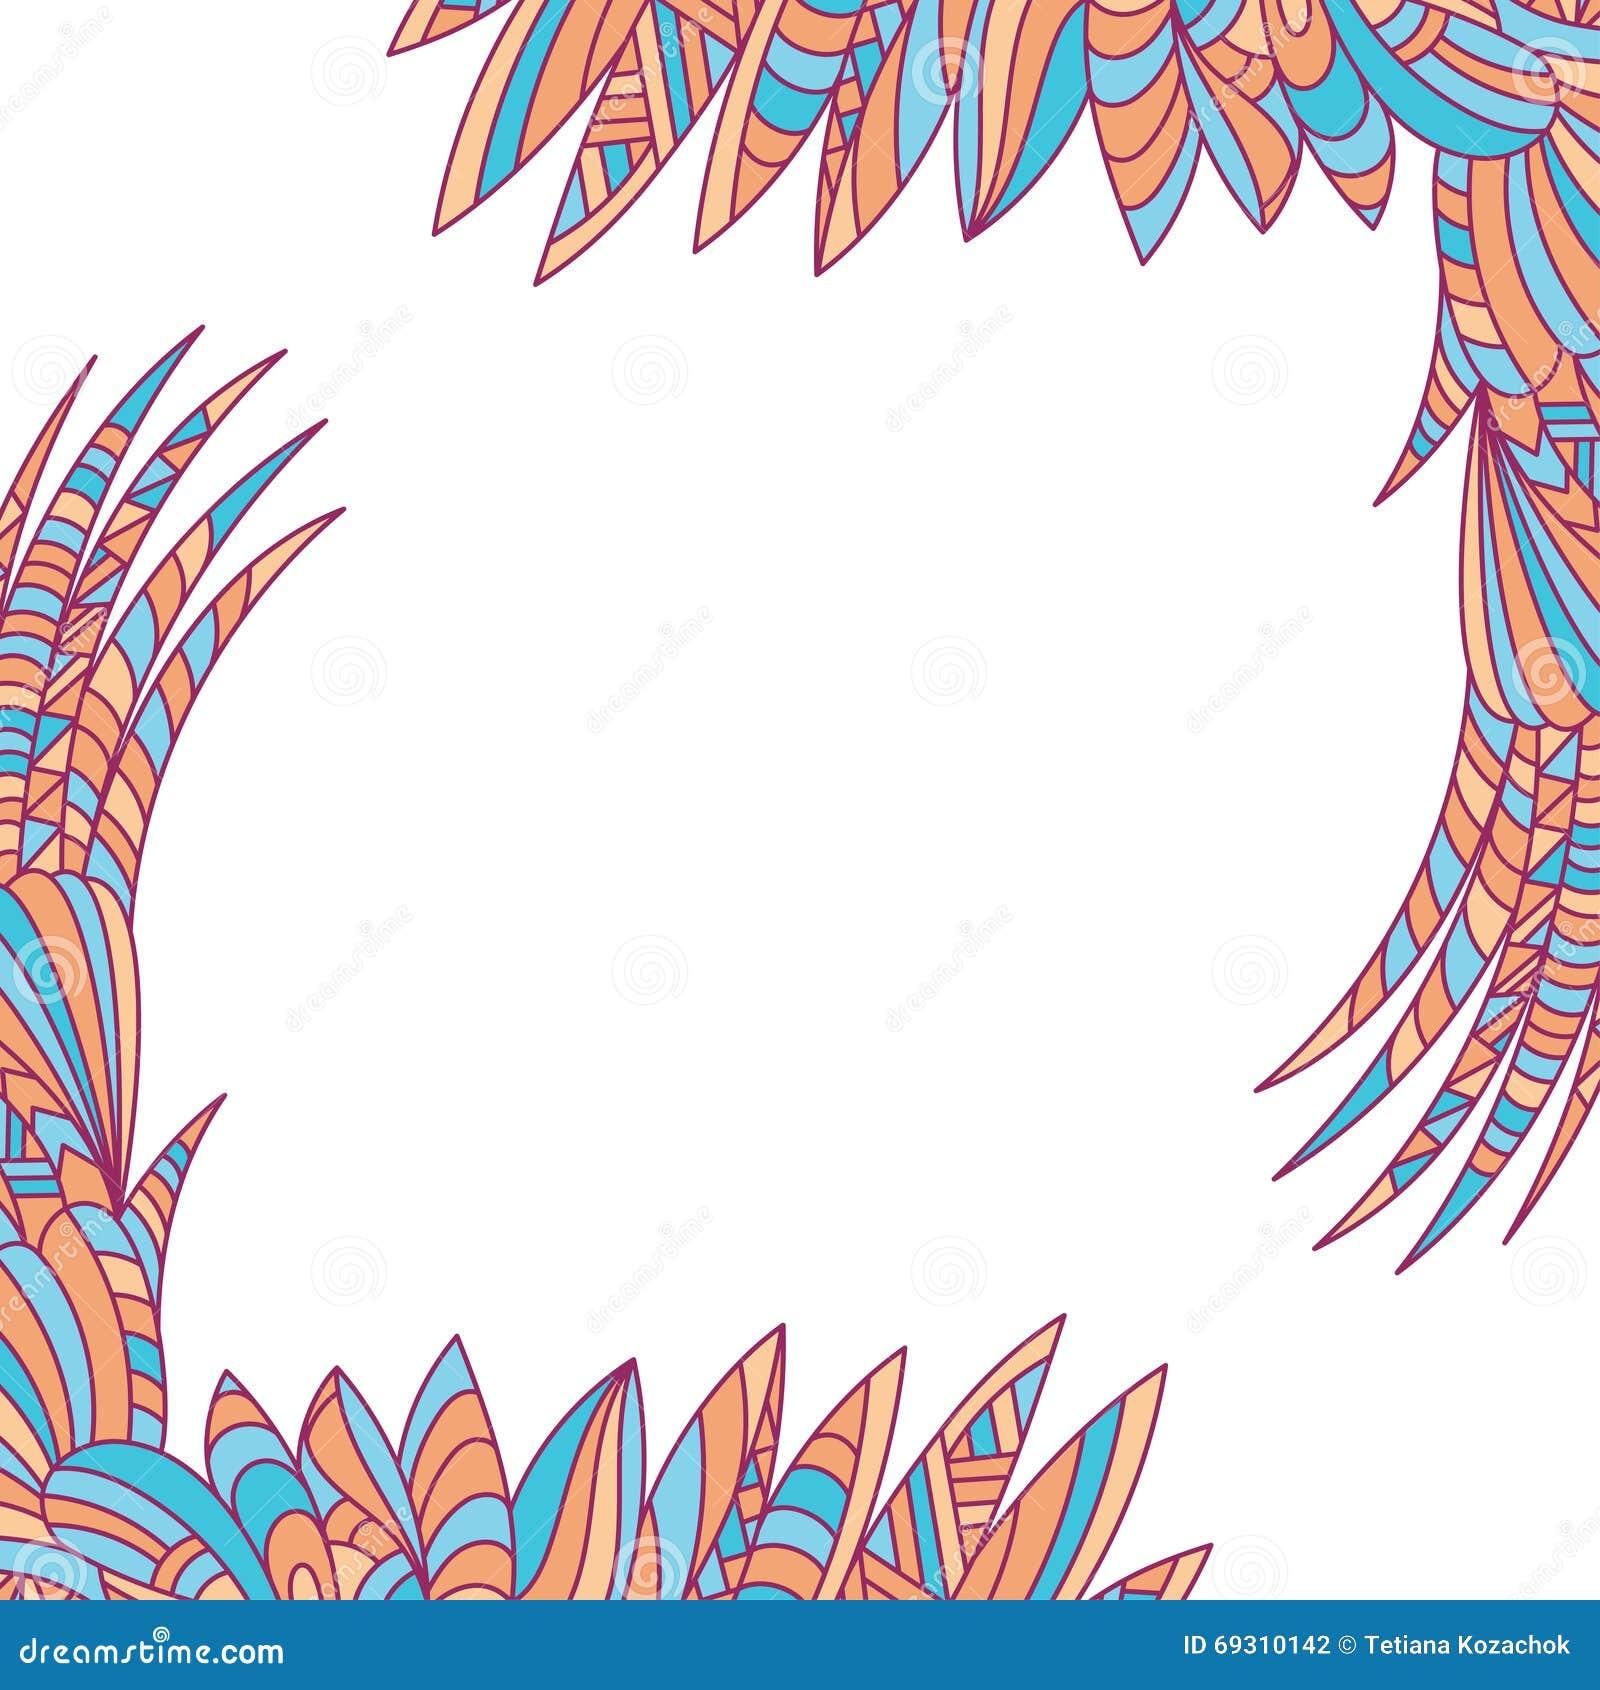 Vector Decorative Element Border Abstract Invitation Card